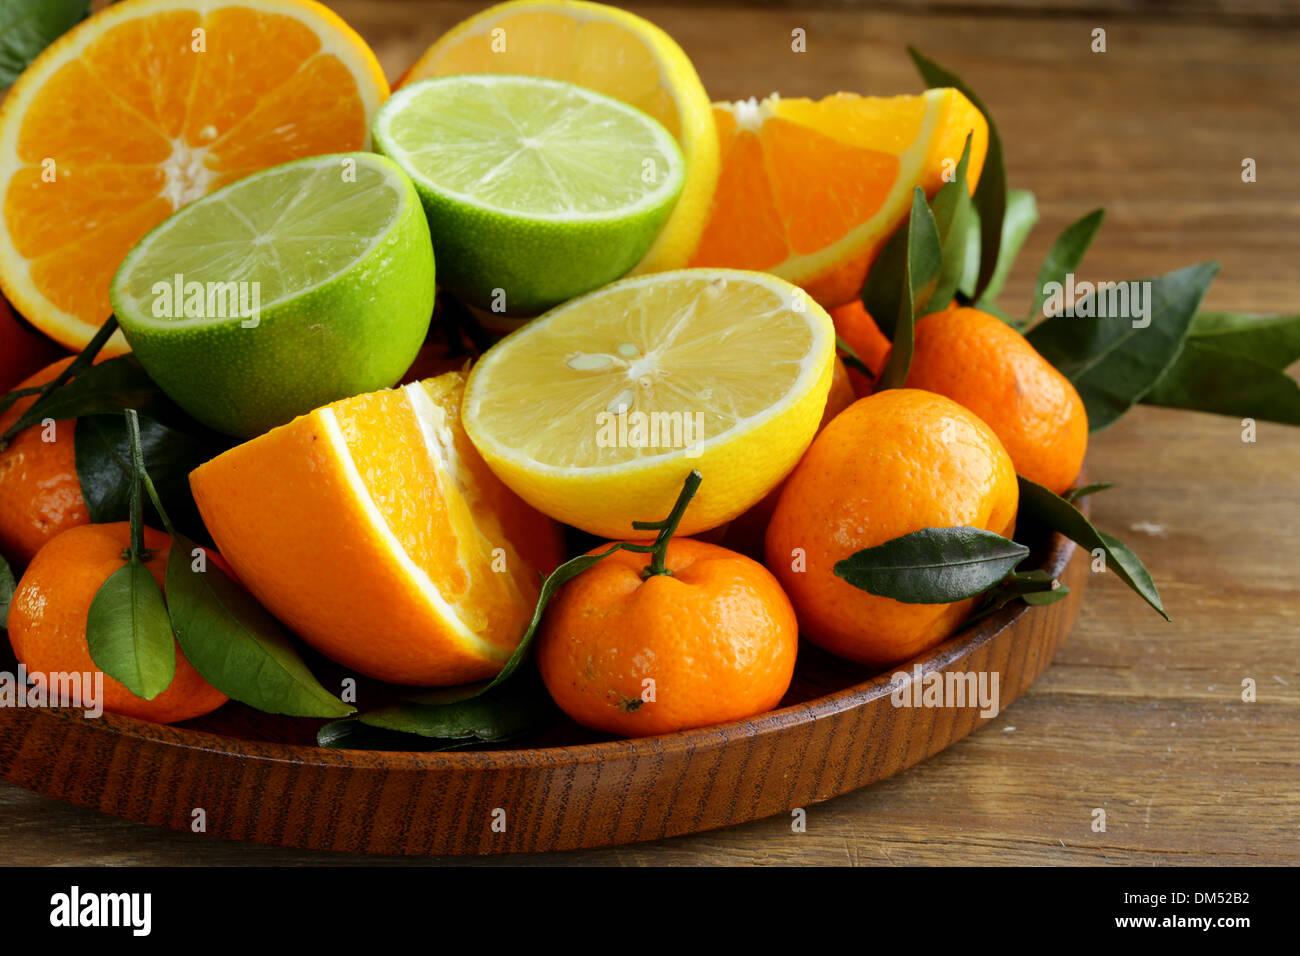 different types of citrus fruits (orange, lime, lemon, tangerine) - Stock Image